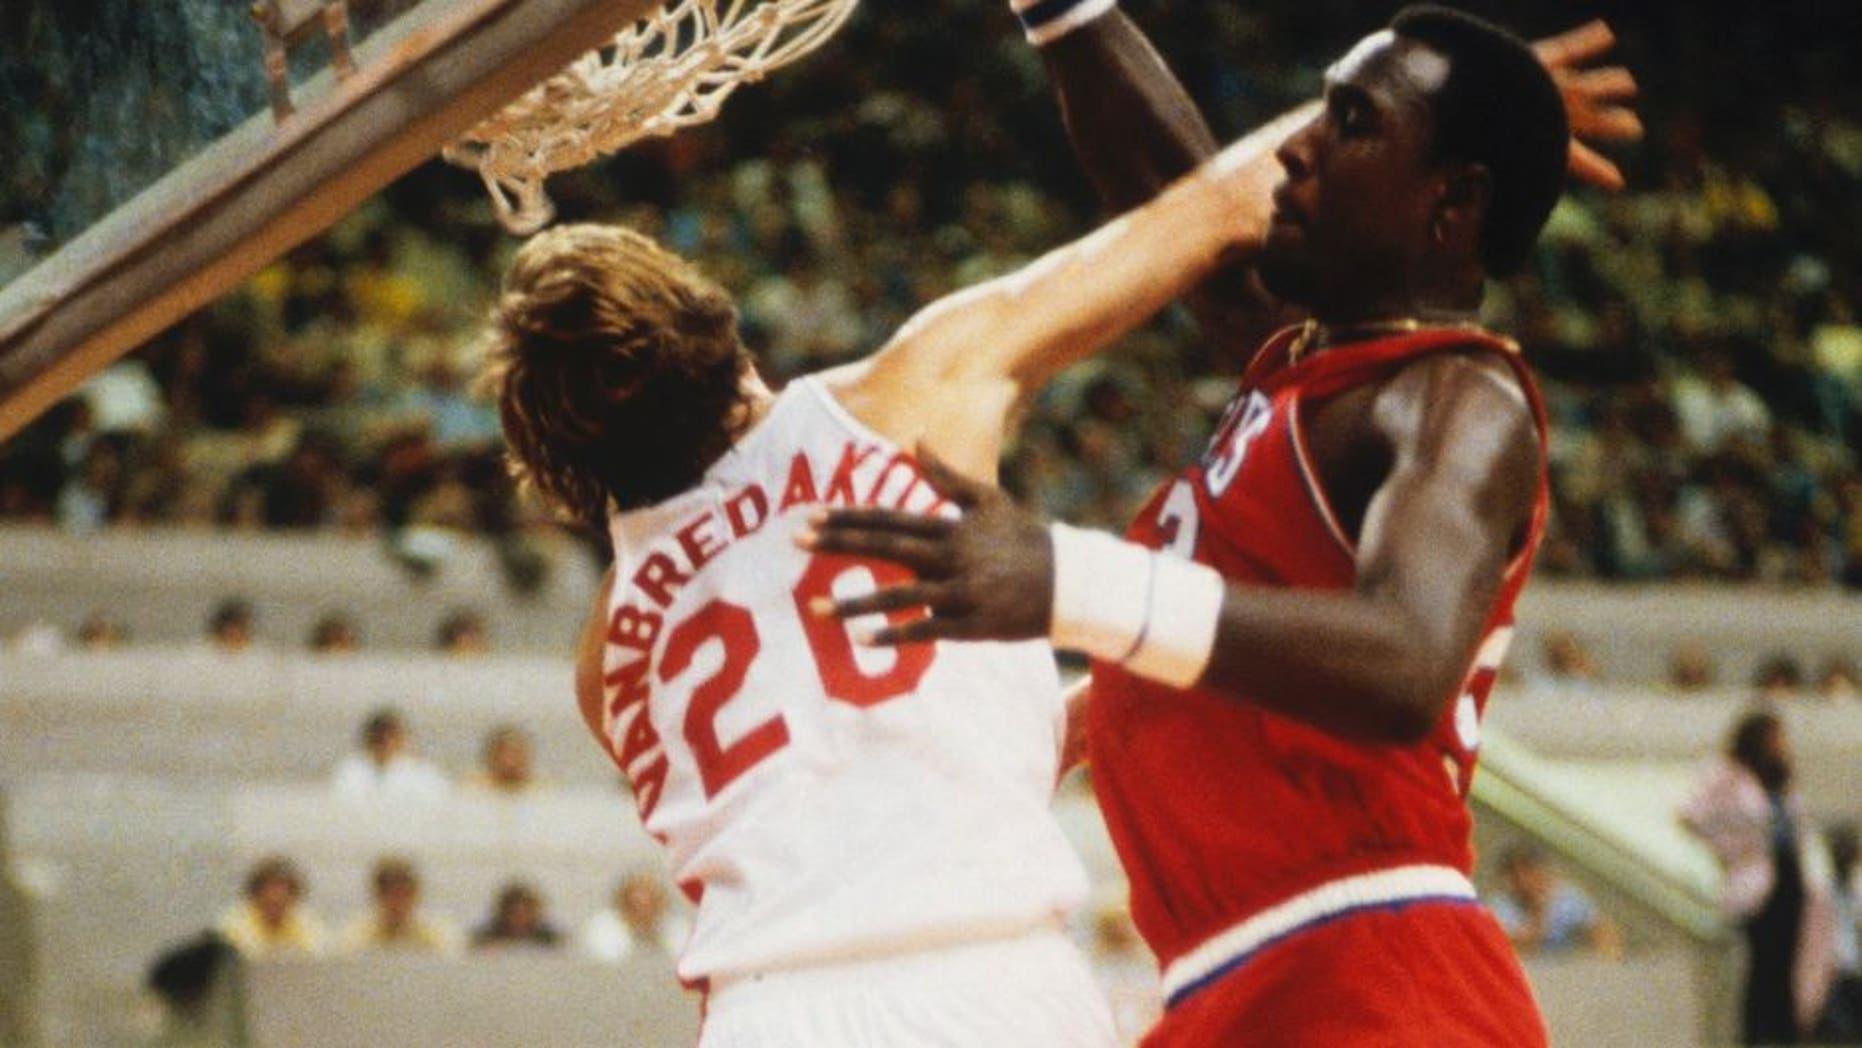 UNDATED: Philadelphia 76ers' center Darryl Dawkins #53 jumps to dunk against New York Nets' Jan Van Breda Koff #26. (Photo by Focus on Sport/Getty Images) *** Local Caption *** Darryl Dawkins;Jan Van Breda Koff